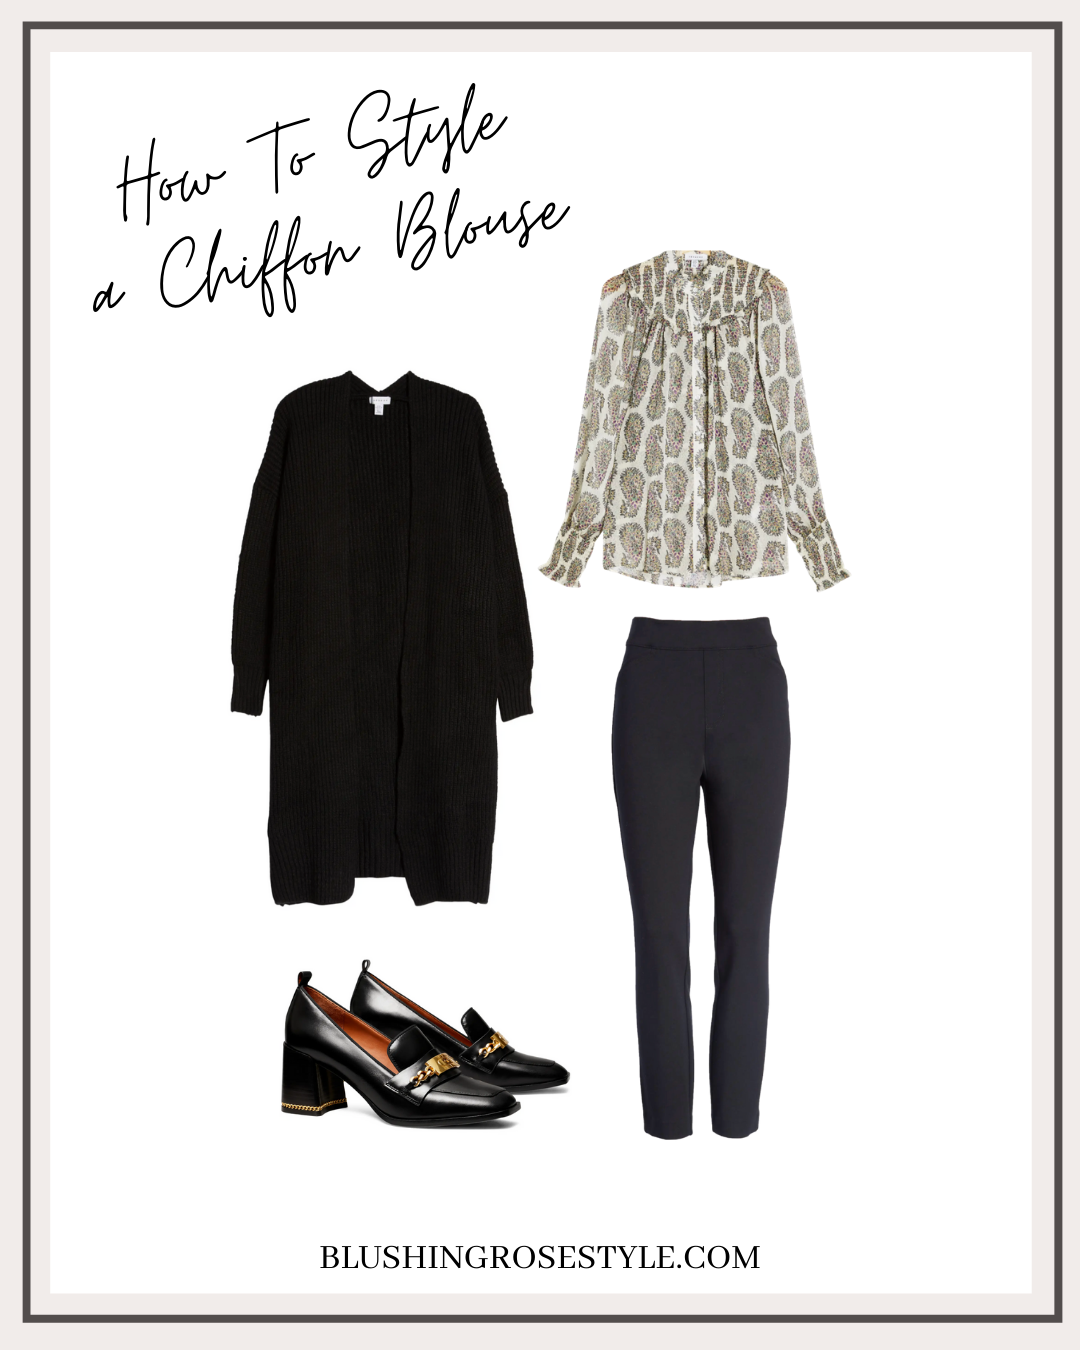 how to style chiffon blouse, workwear option